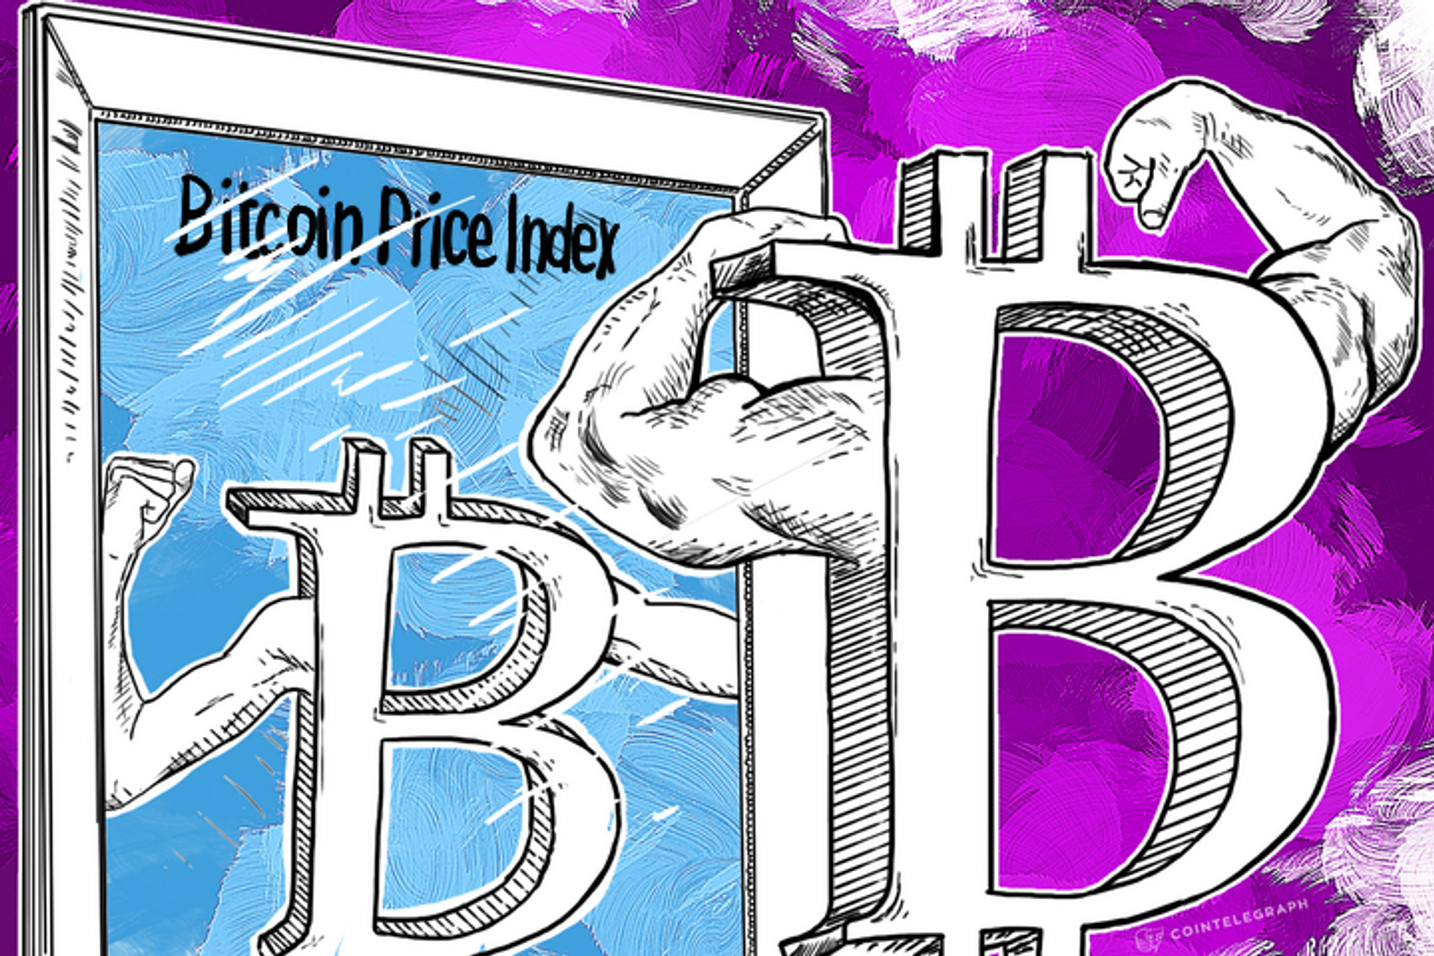 The Bitcoin Price Index Needs Some Serious Fixing